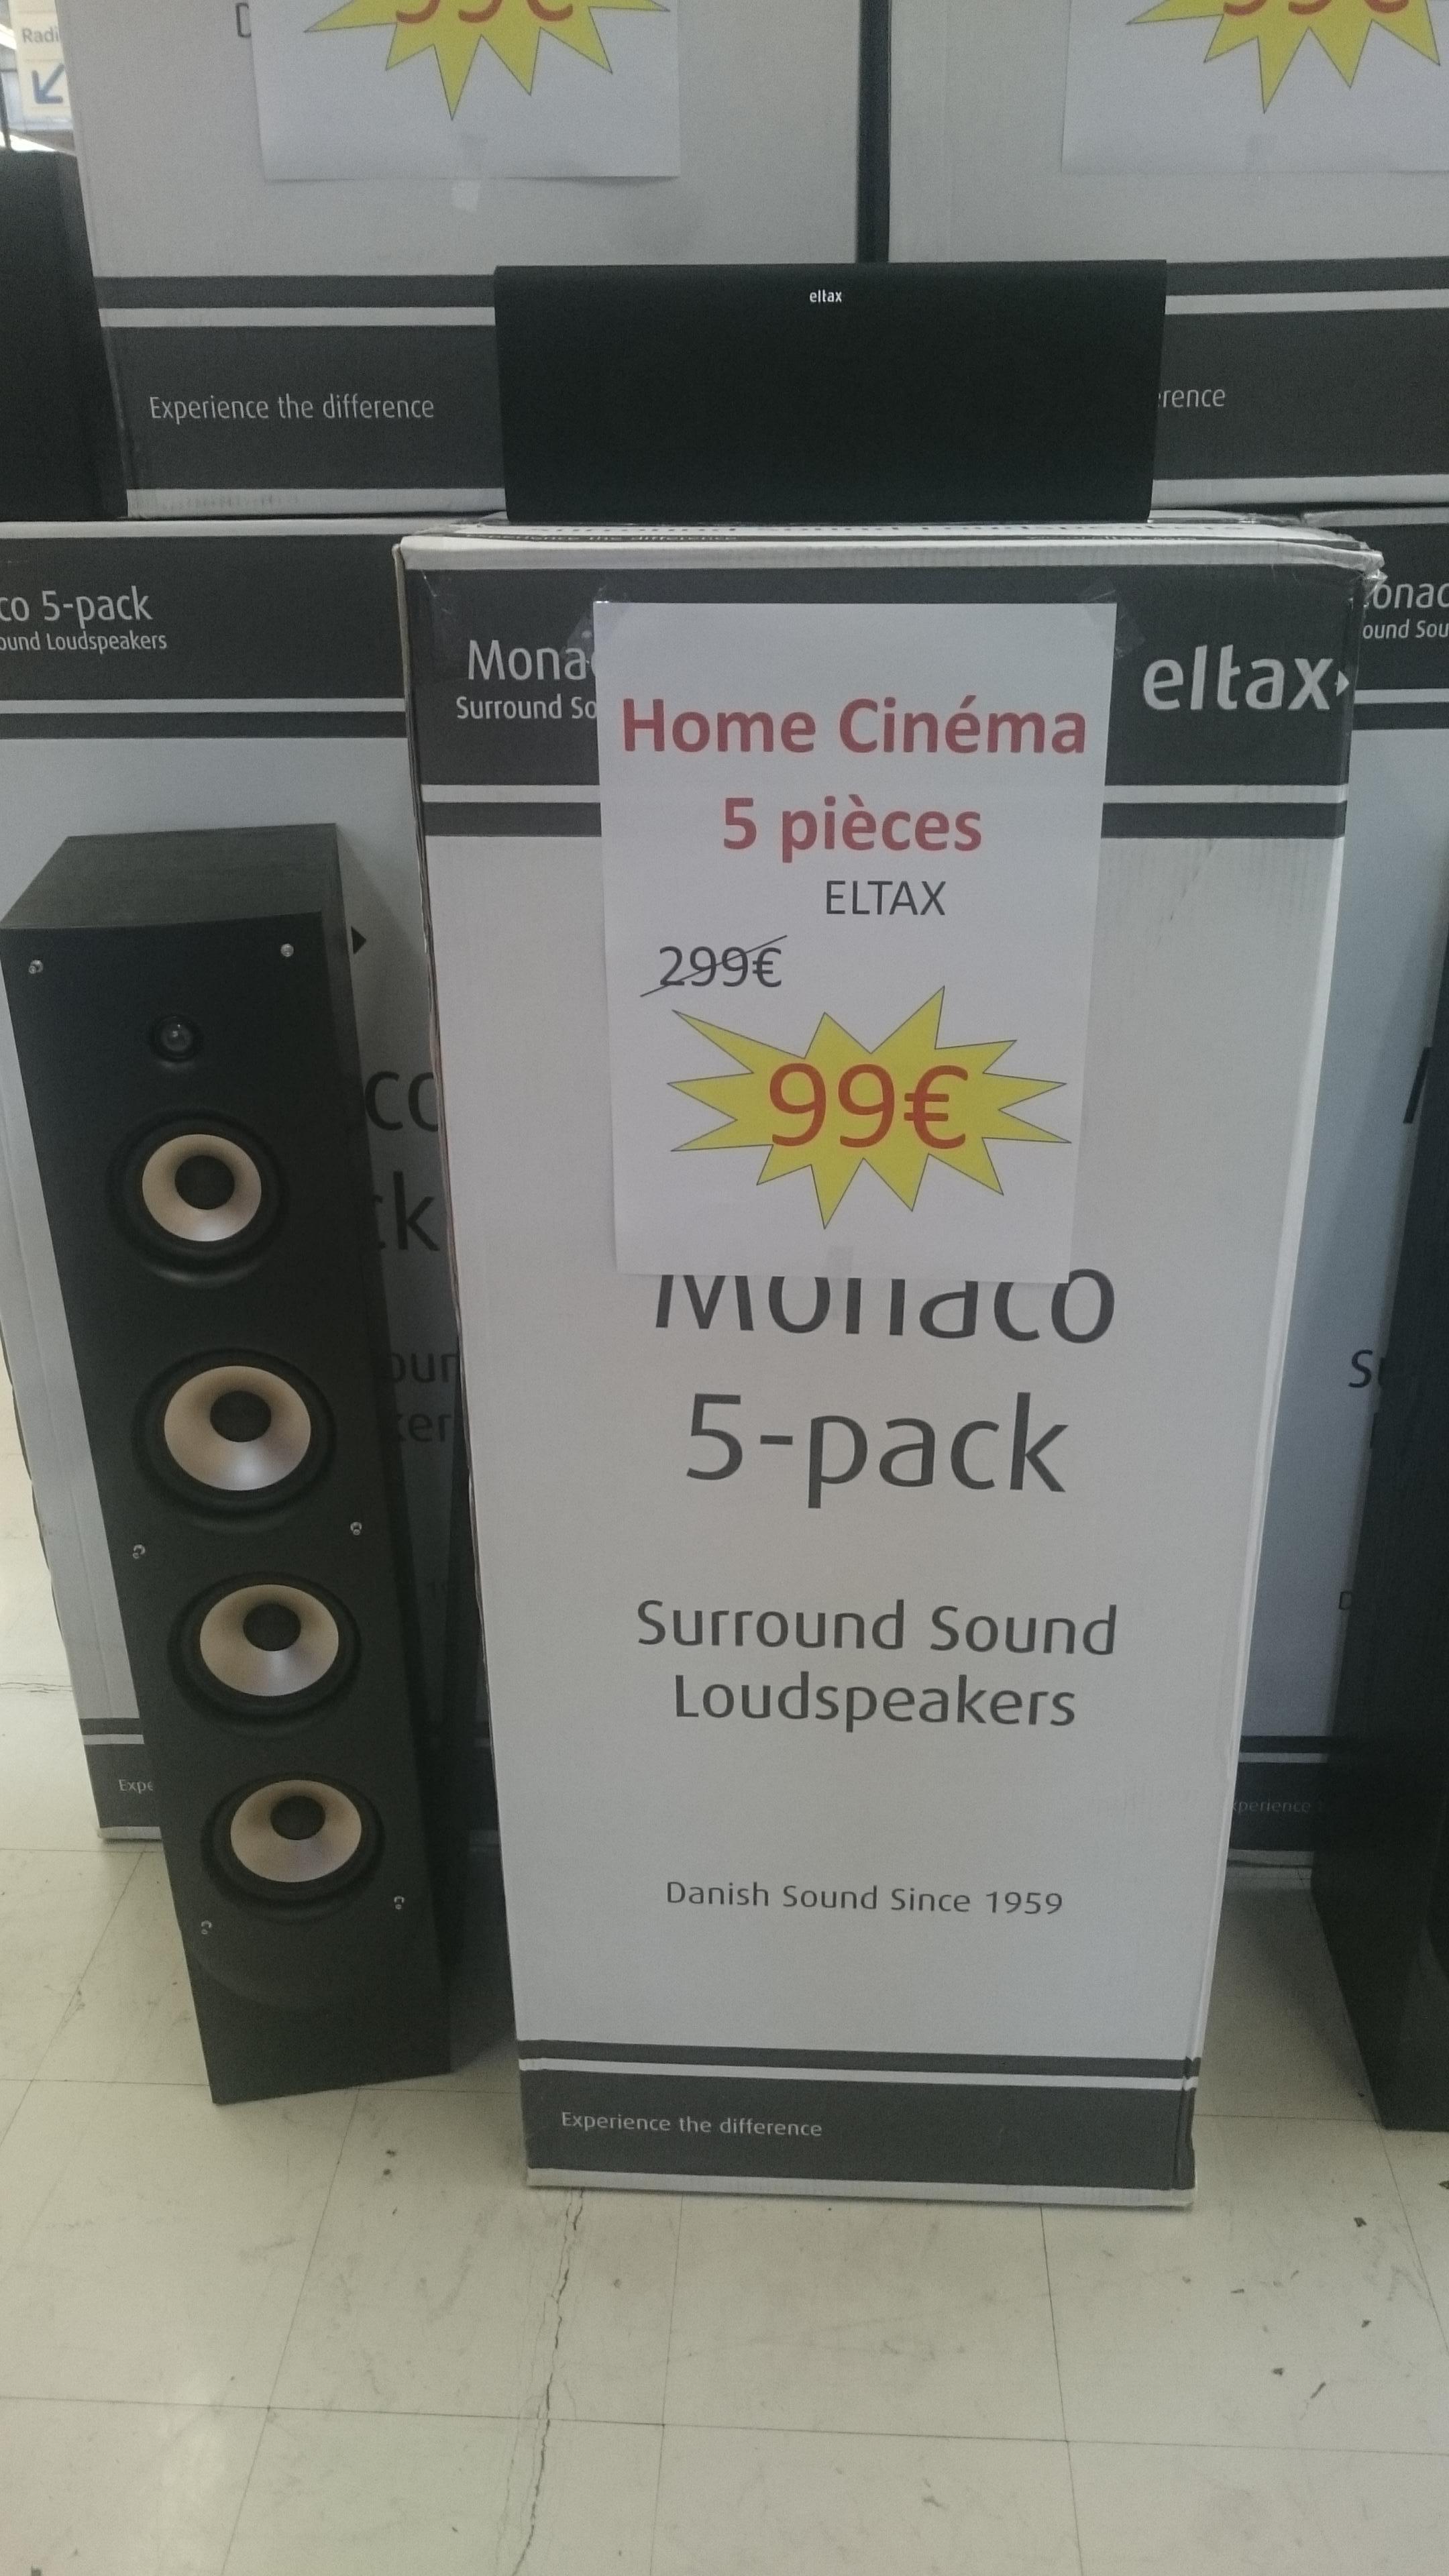 Home Cinéma Eltax Monaco 5-Pack - 3 voies, 100 Watts